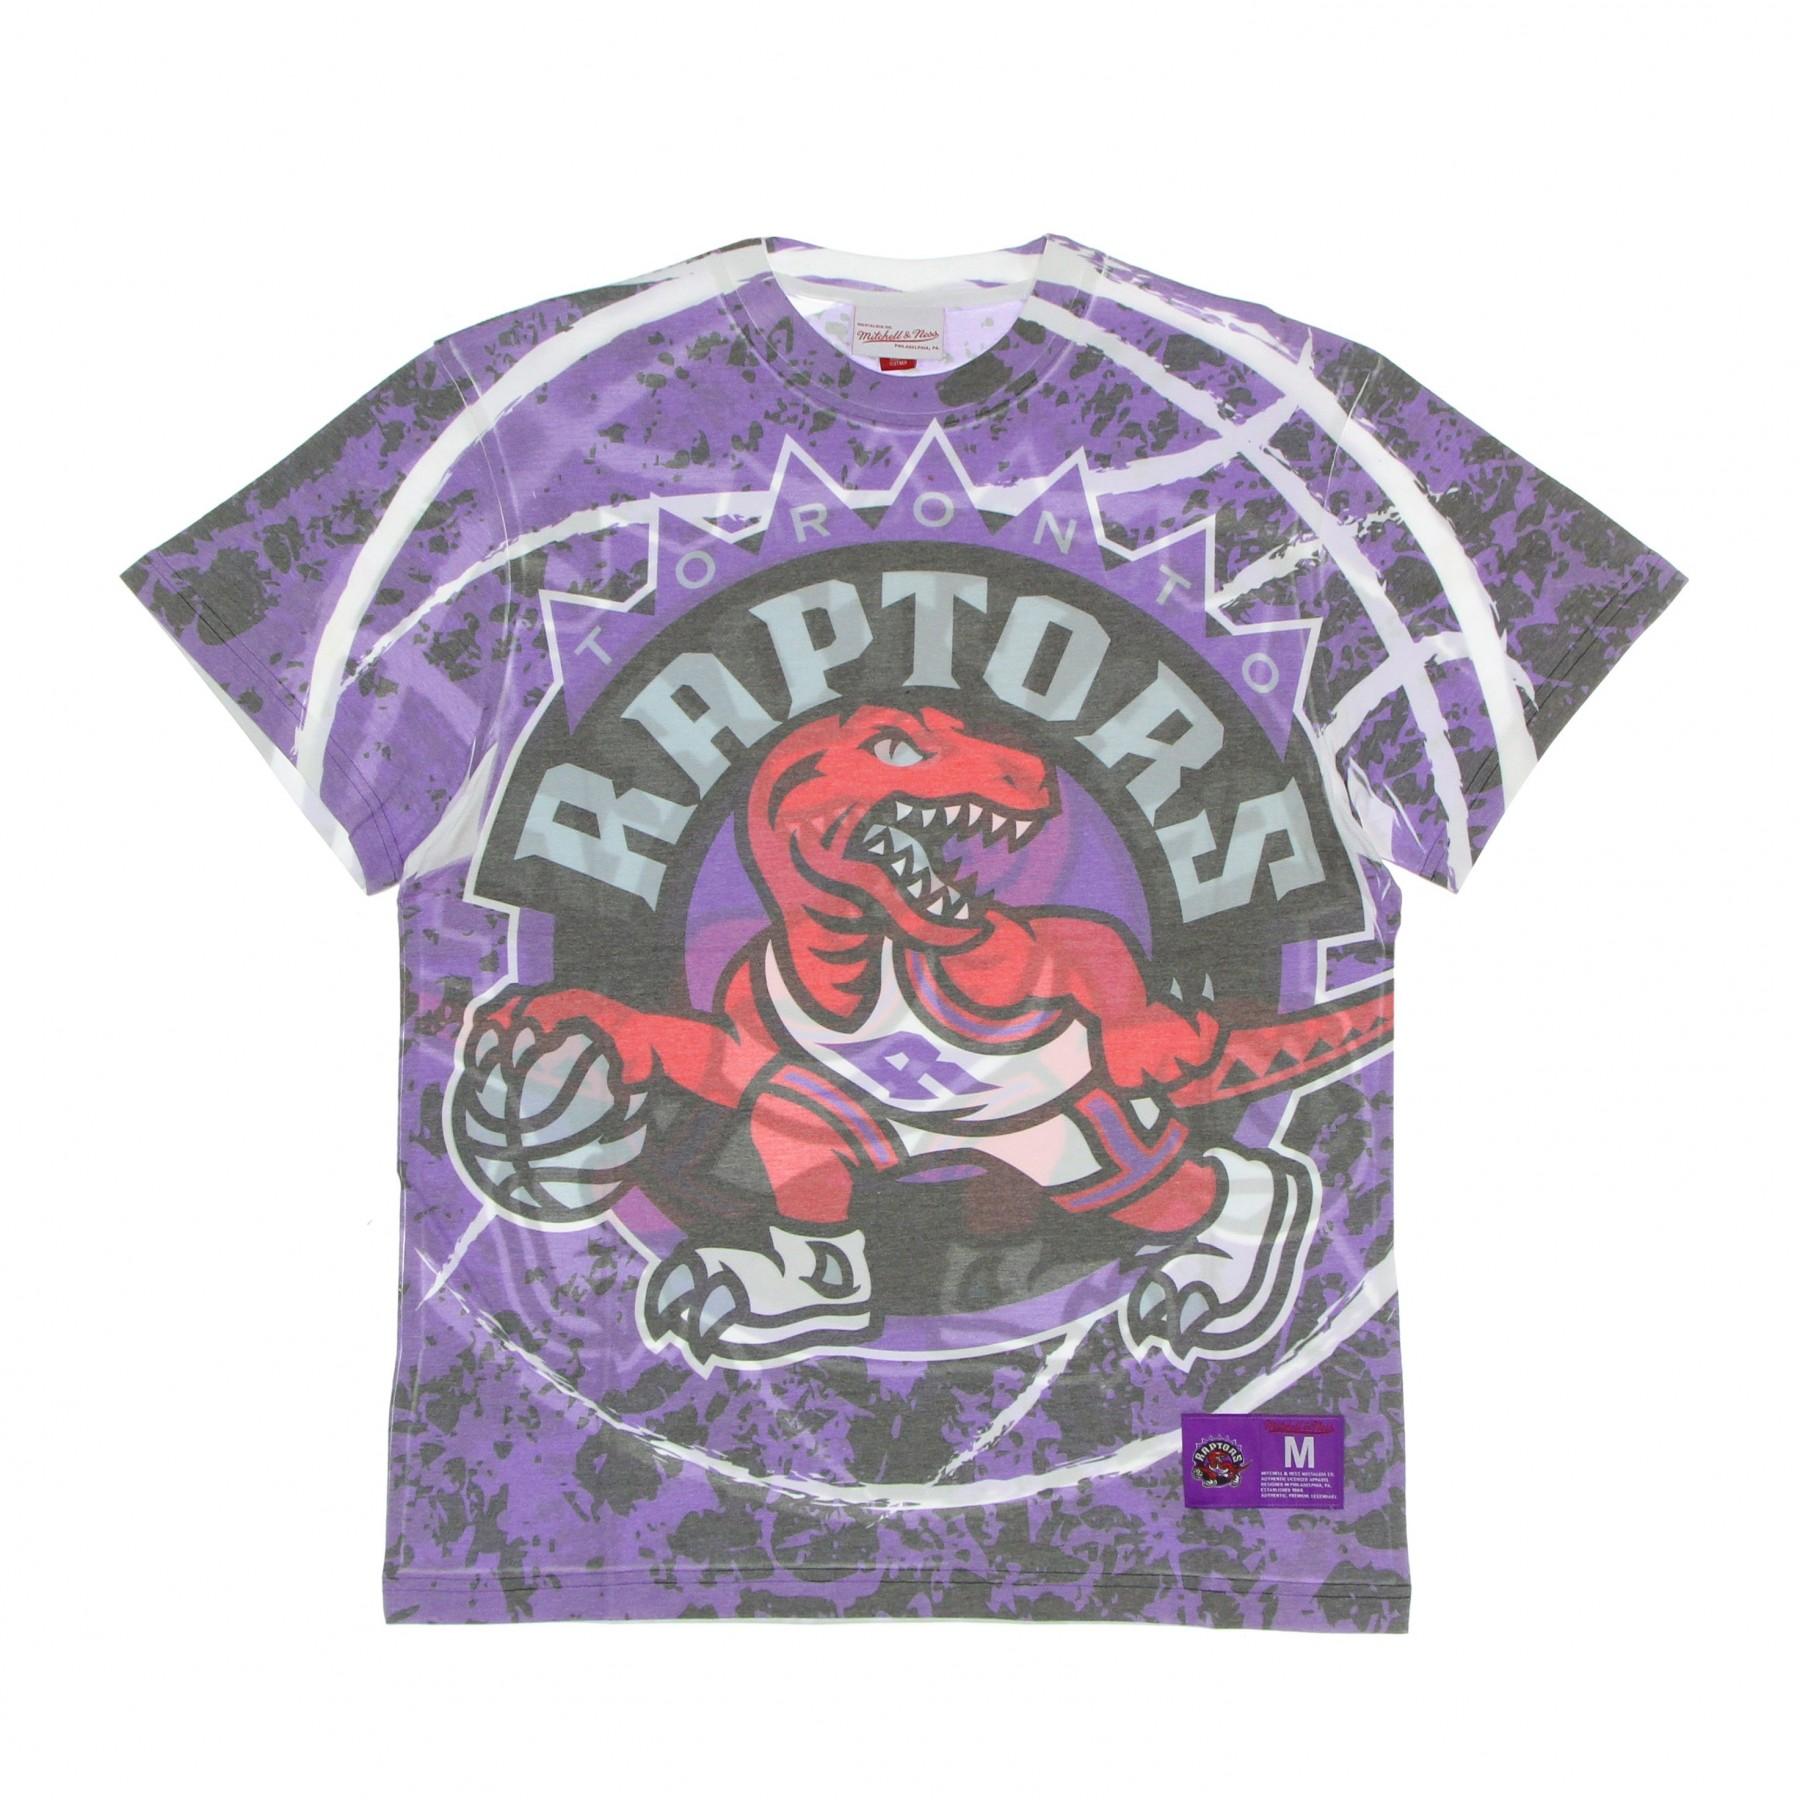 MAGLIETTA UOMO NBA JUMBOTRON TEE HARDWOOD CLASSICS TORRAP M